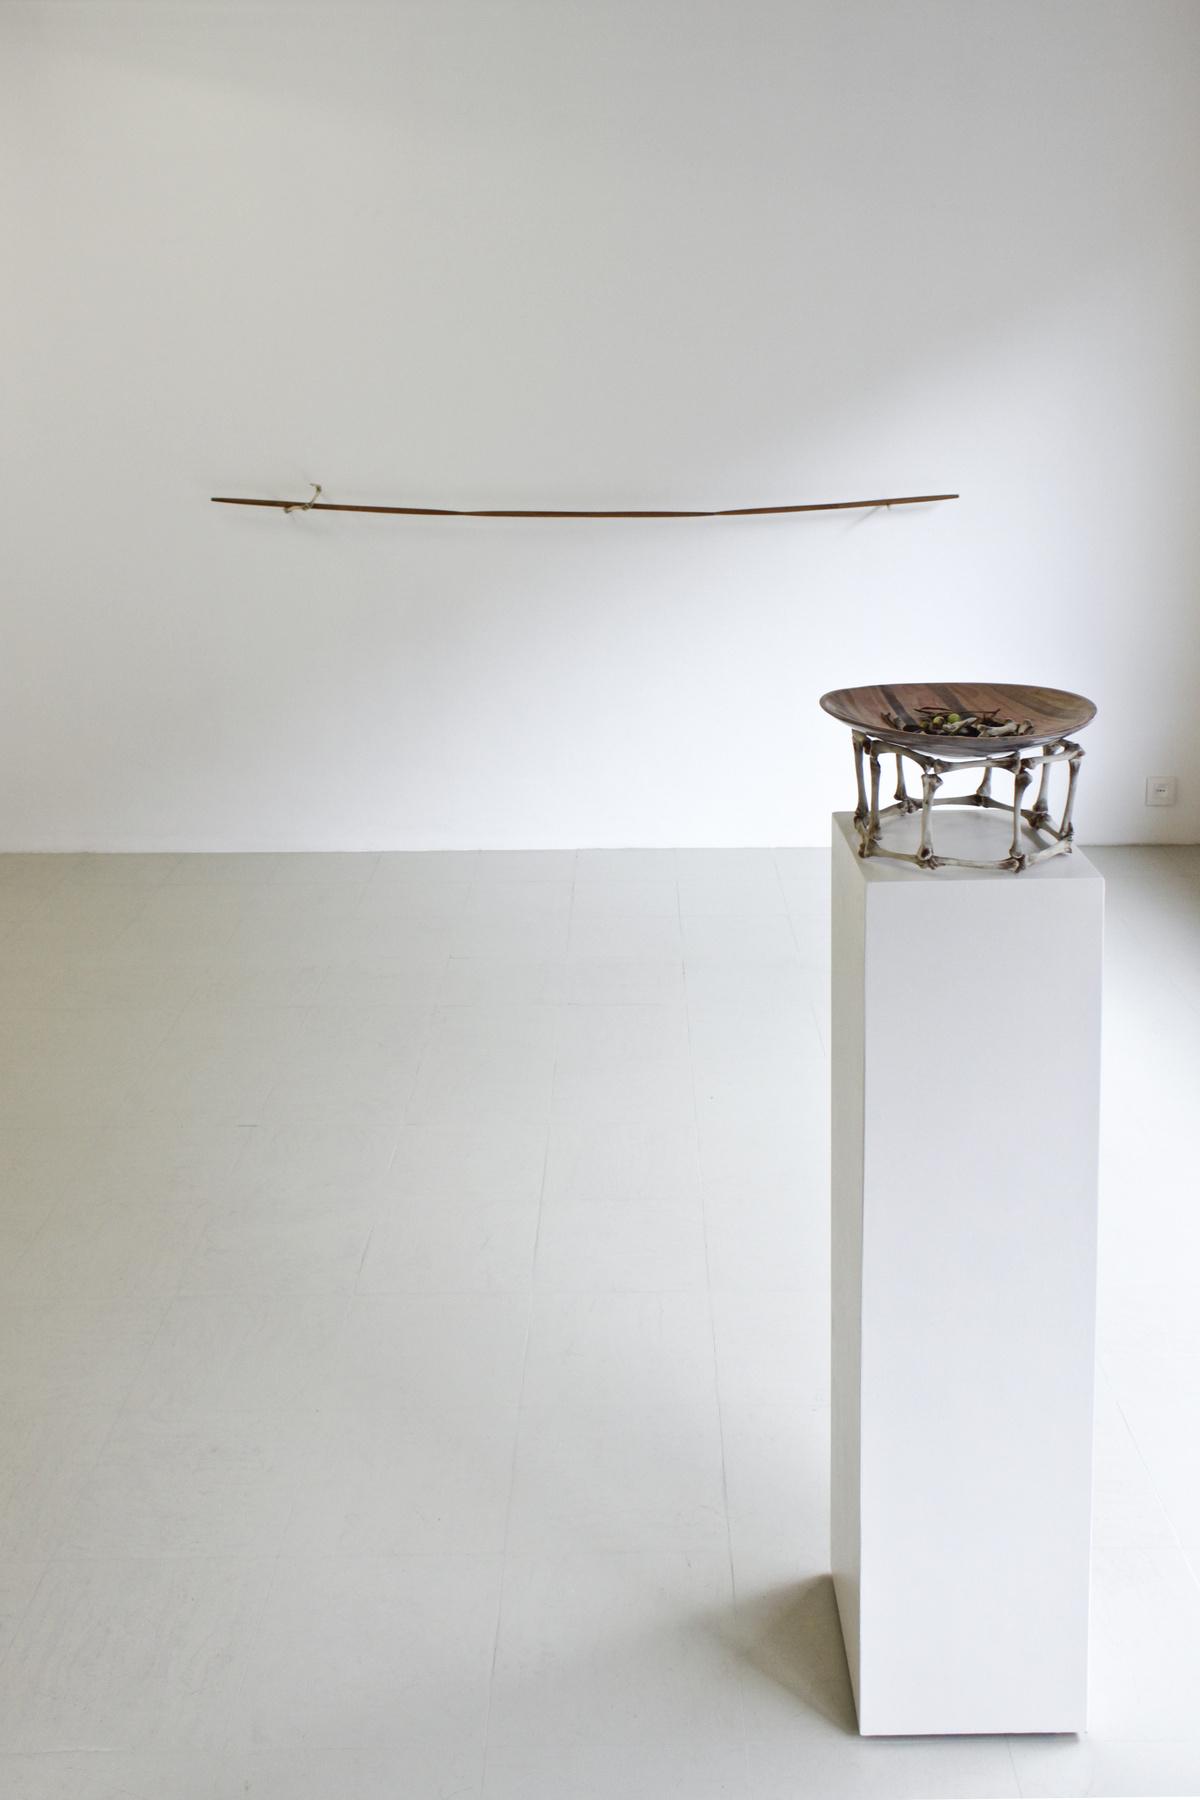 01 Gallery Install 04_Federico Acal